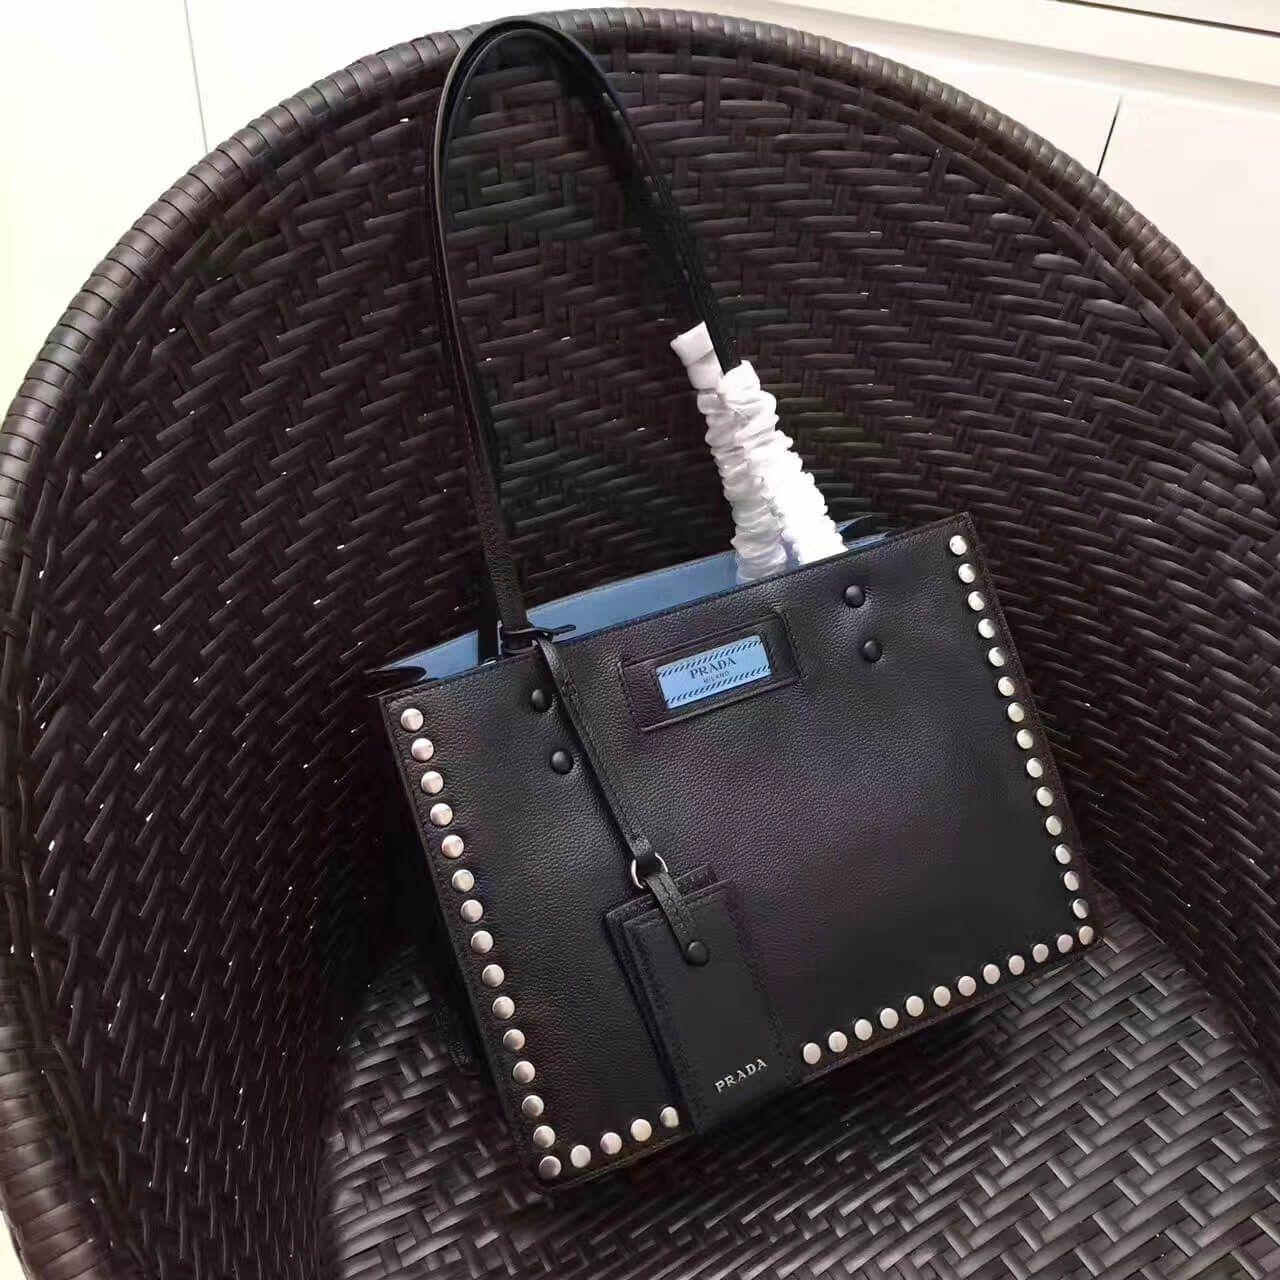 74a78d0652 Prada Etiquette Calf Leather Tote with Metal Stud Trim 1BG121 Black 2017